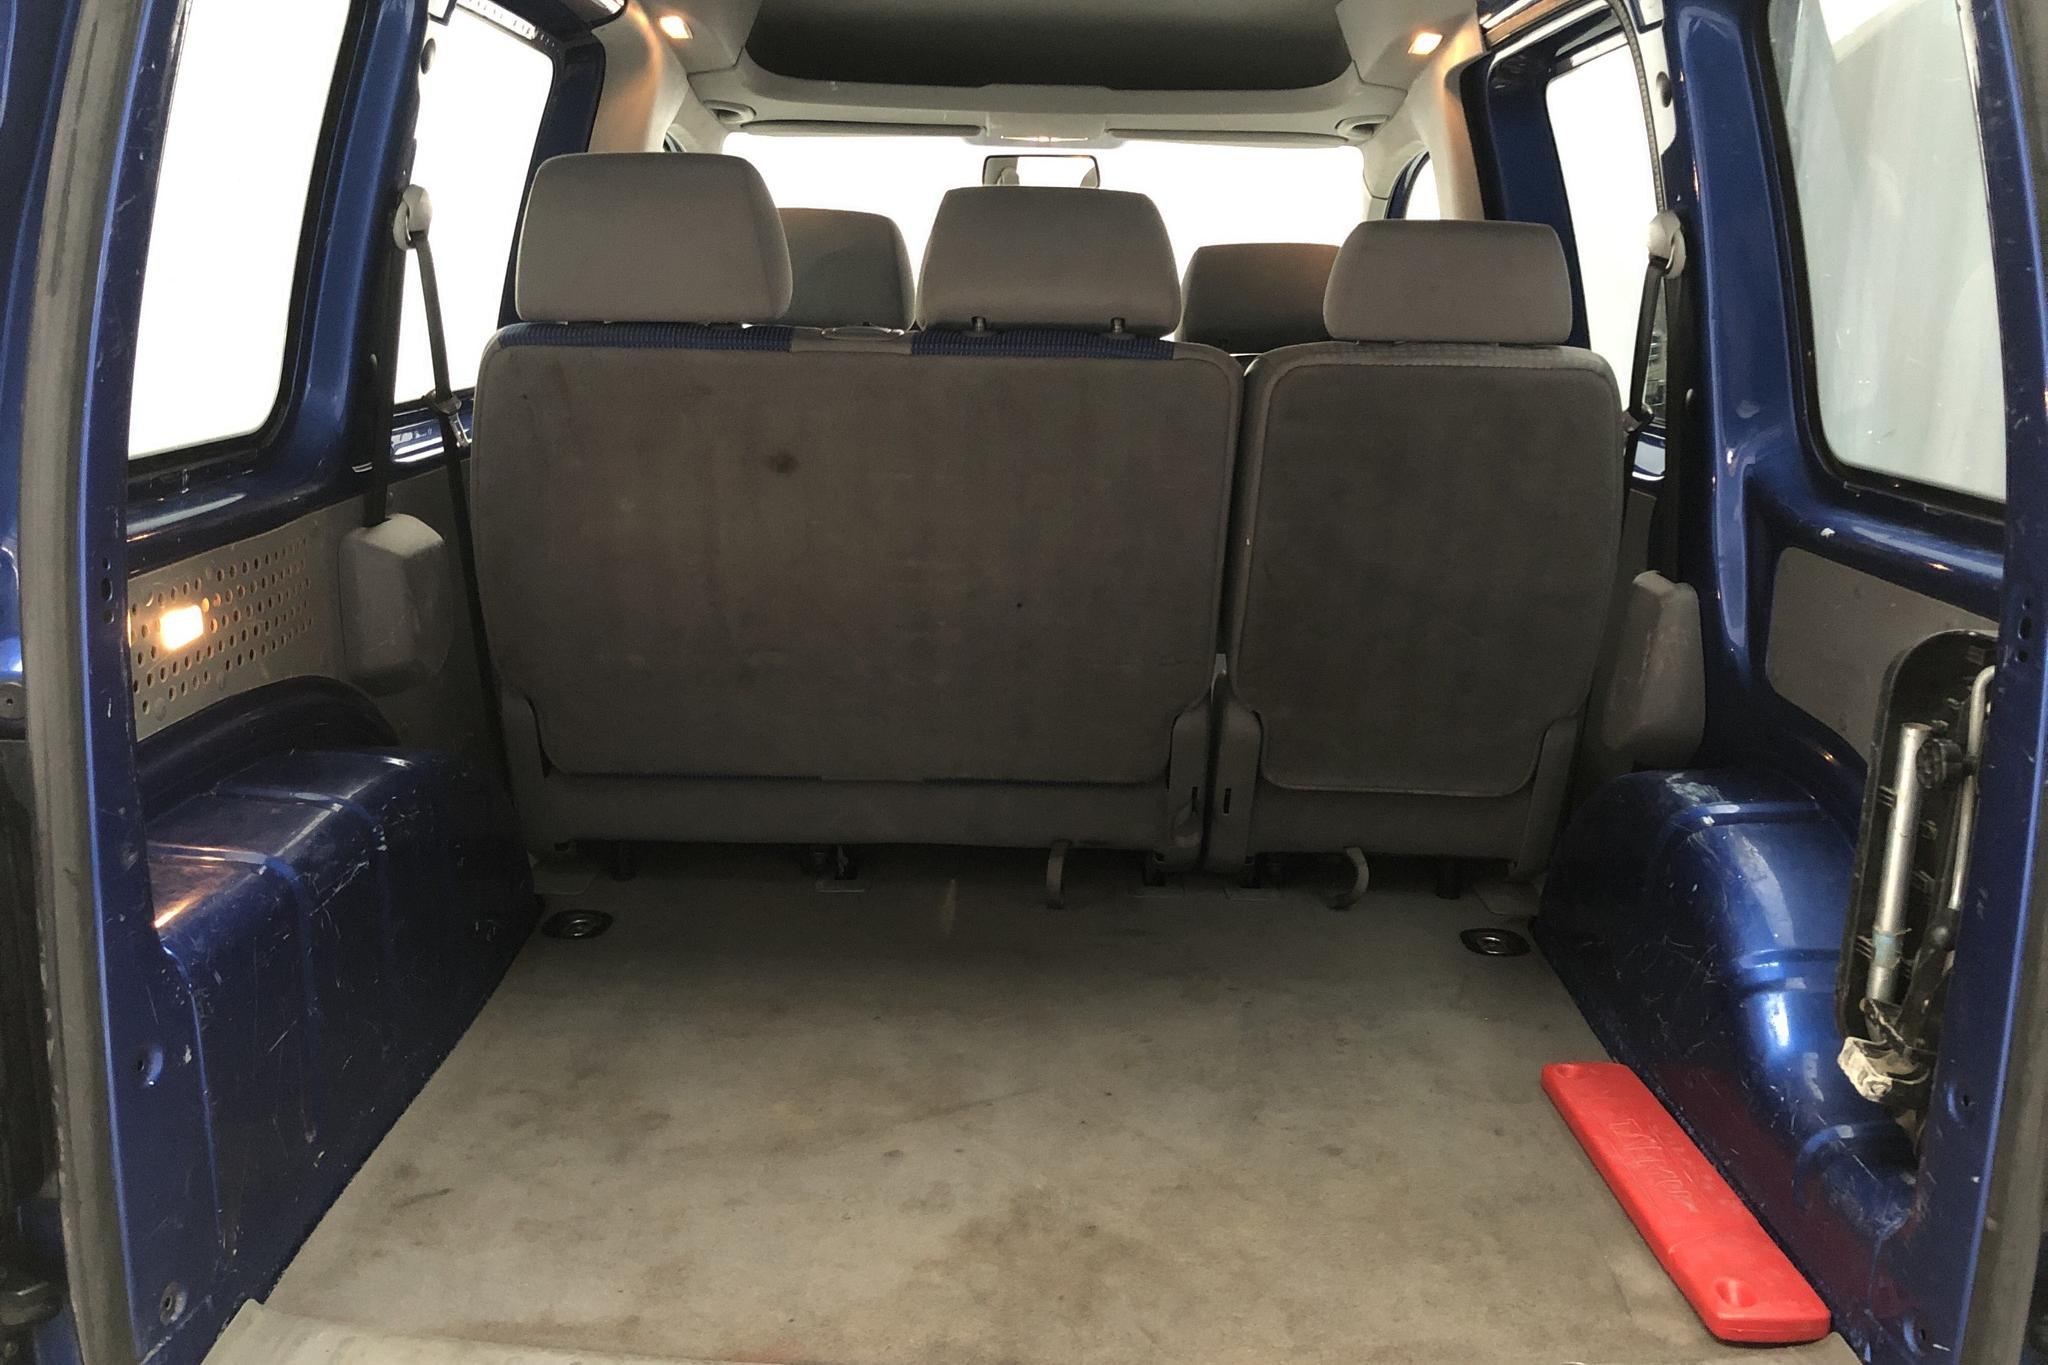 VW Caddy Life 1.4 (75hk) - 301 450 km - Manual - blue - 2004